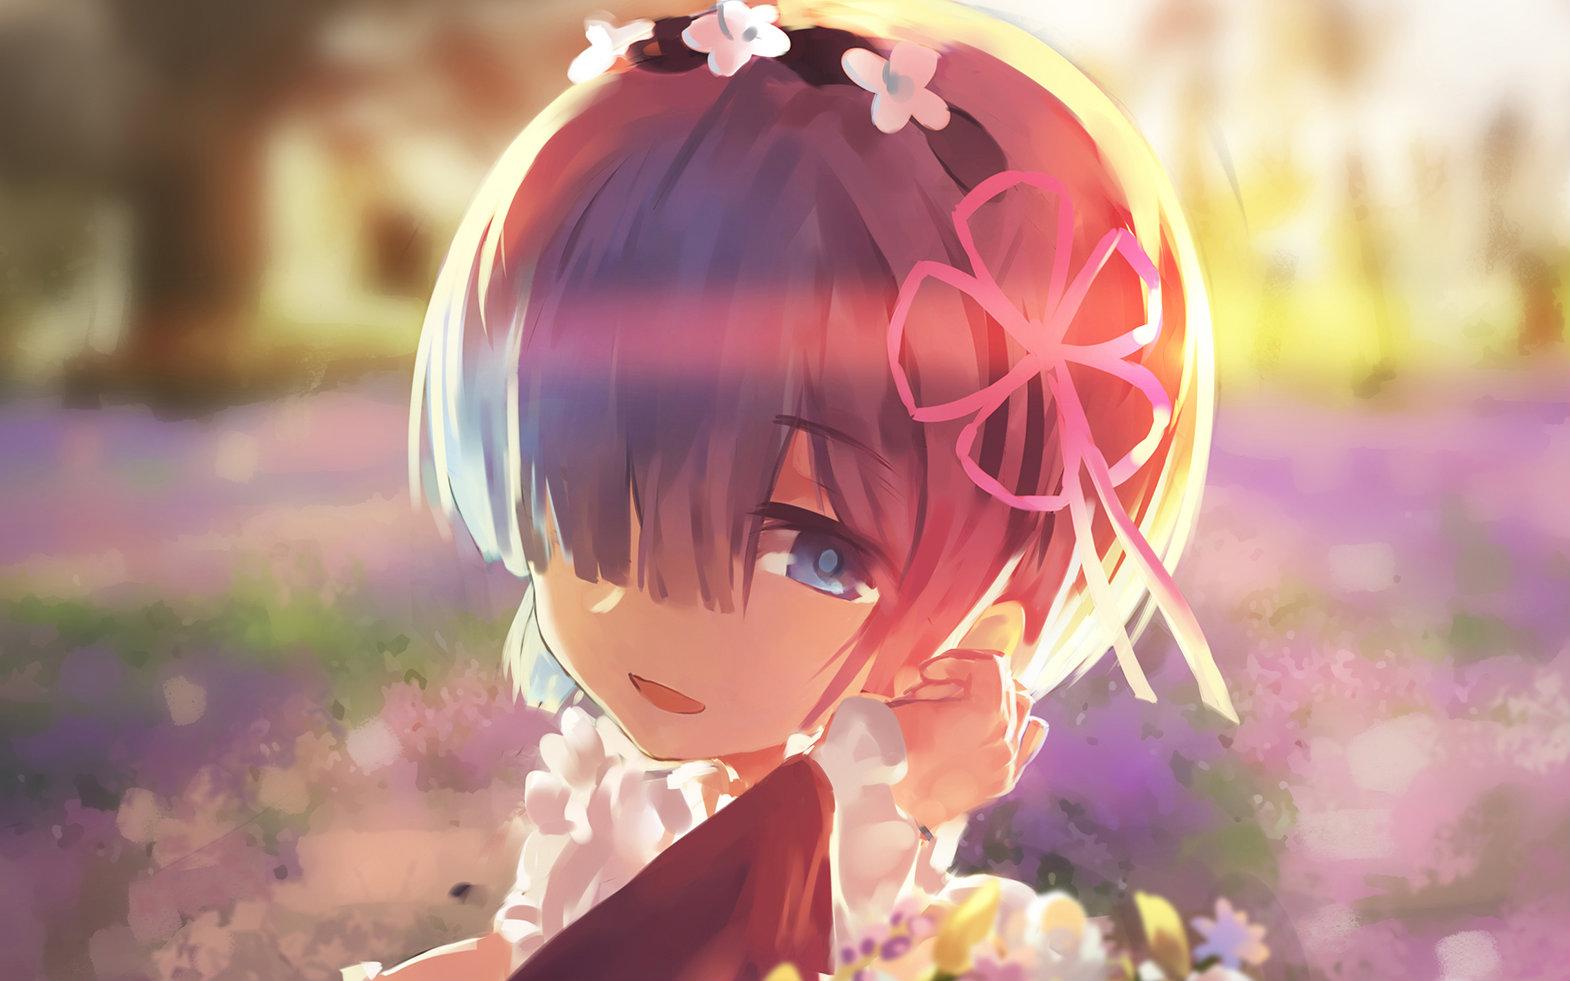 【Re:从零开始的异世界生活】18 插入歌「Wishing」/ 雷姆 (CV:水濑祈)